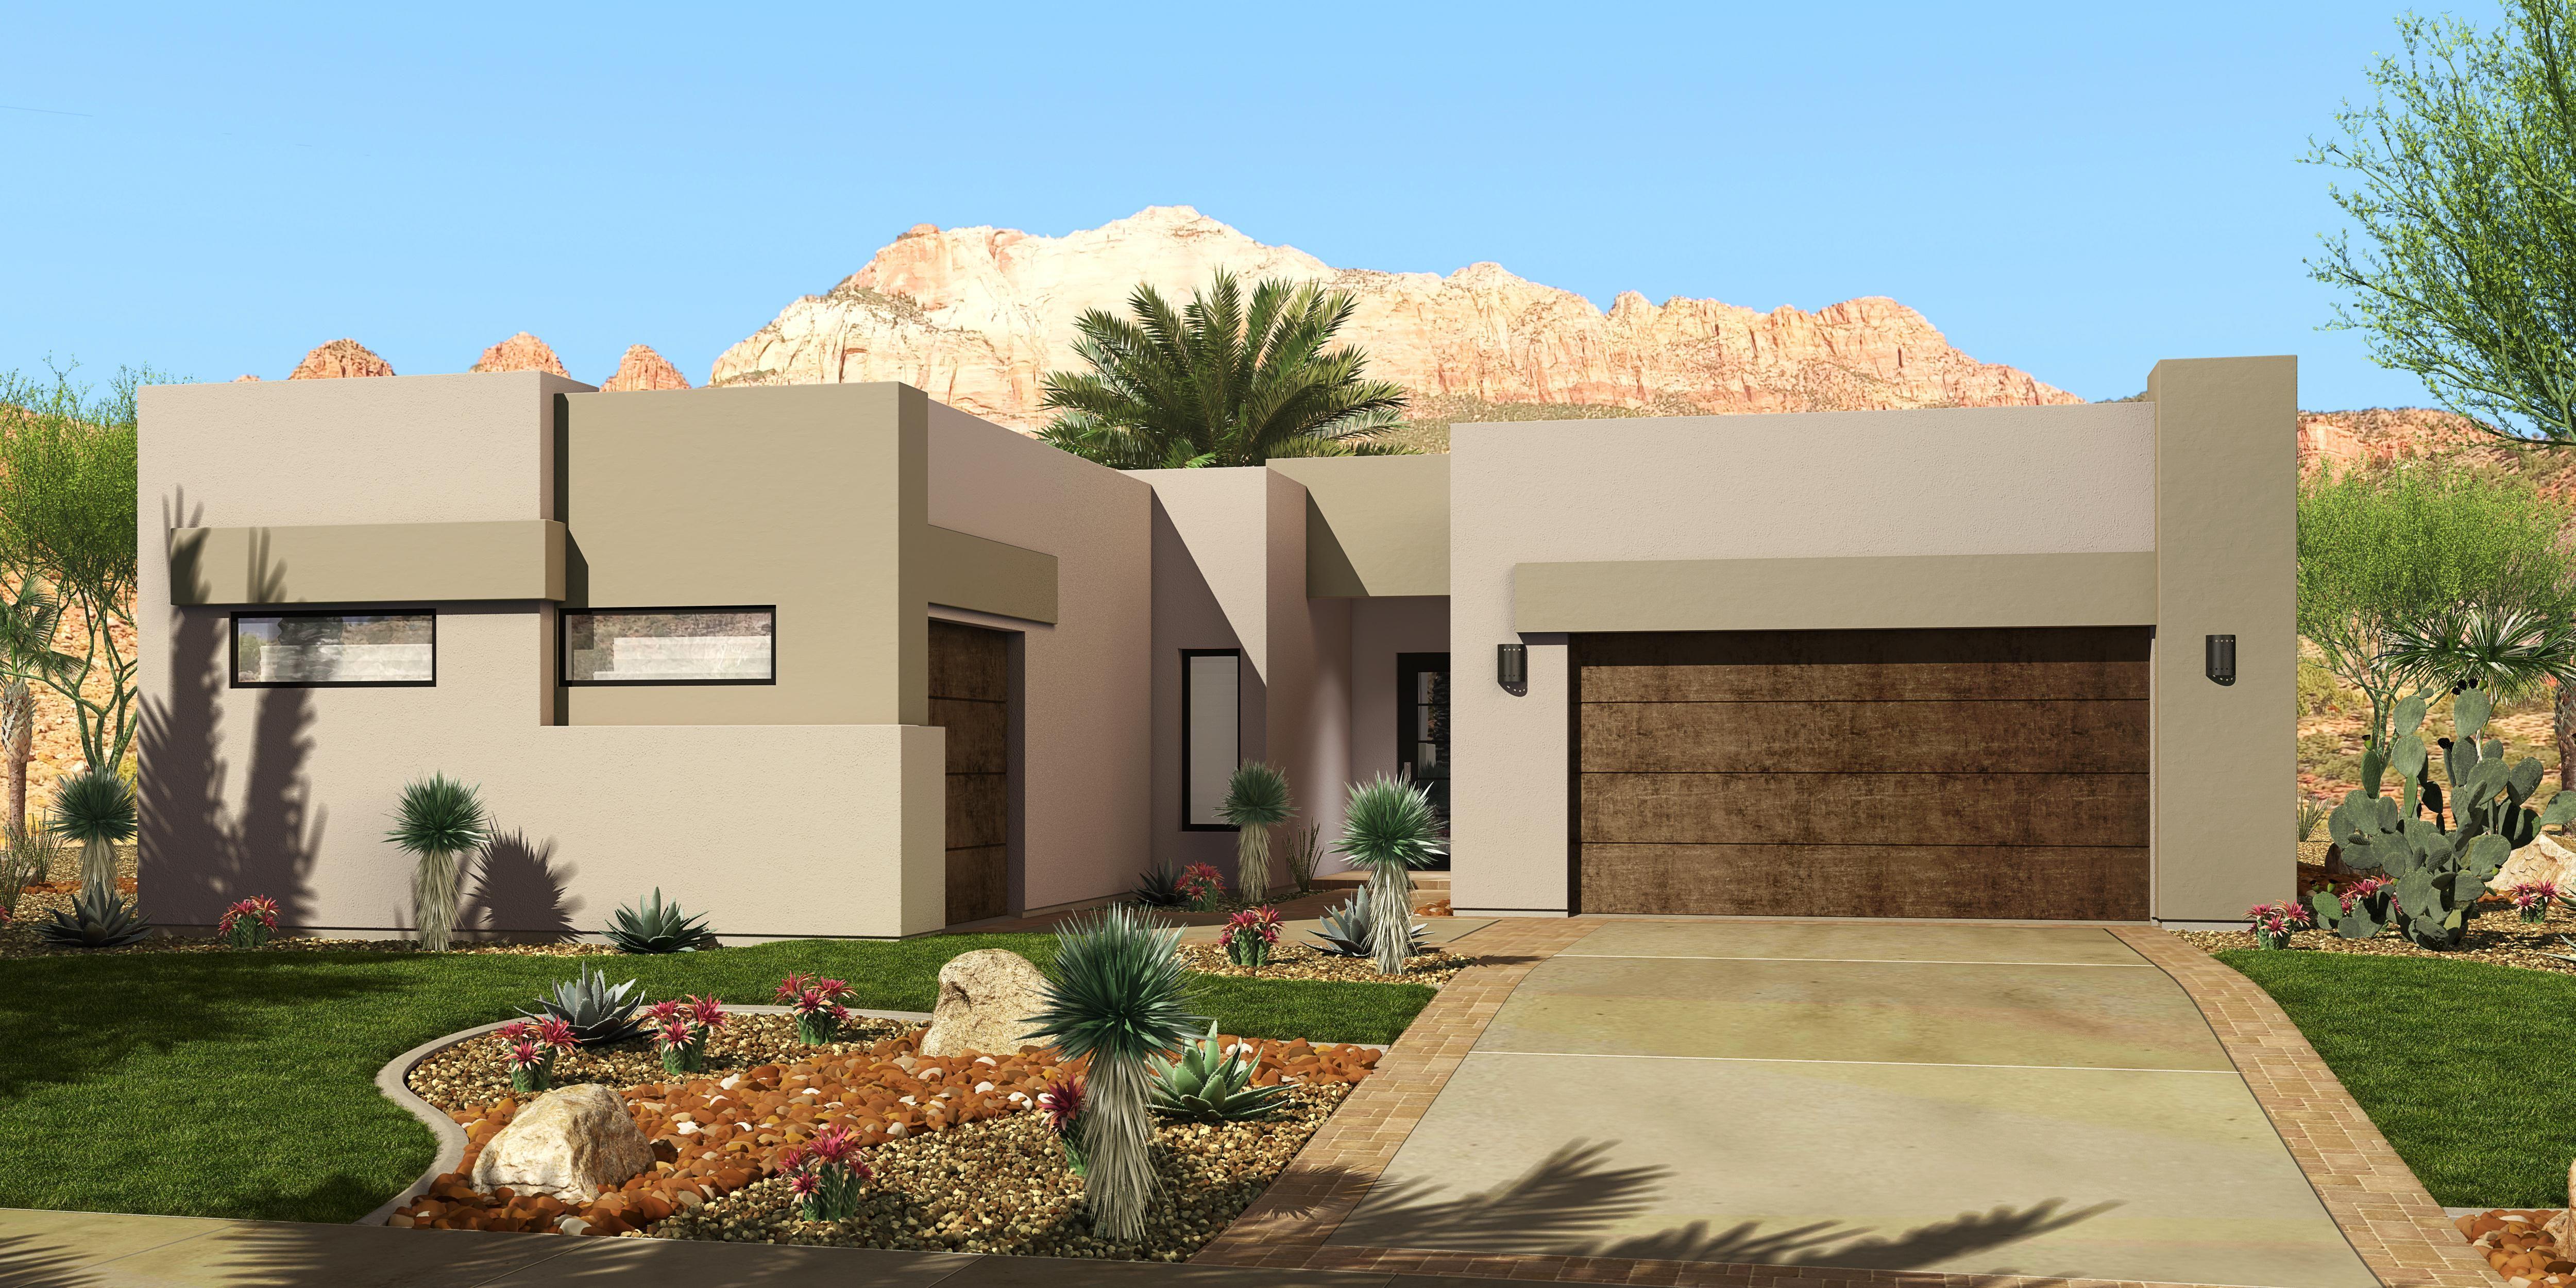 'Moore Rd' by Moore Rd in Tucson